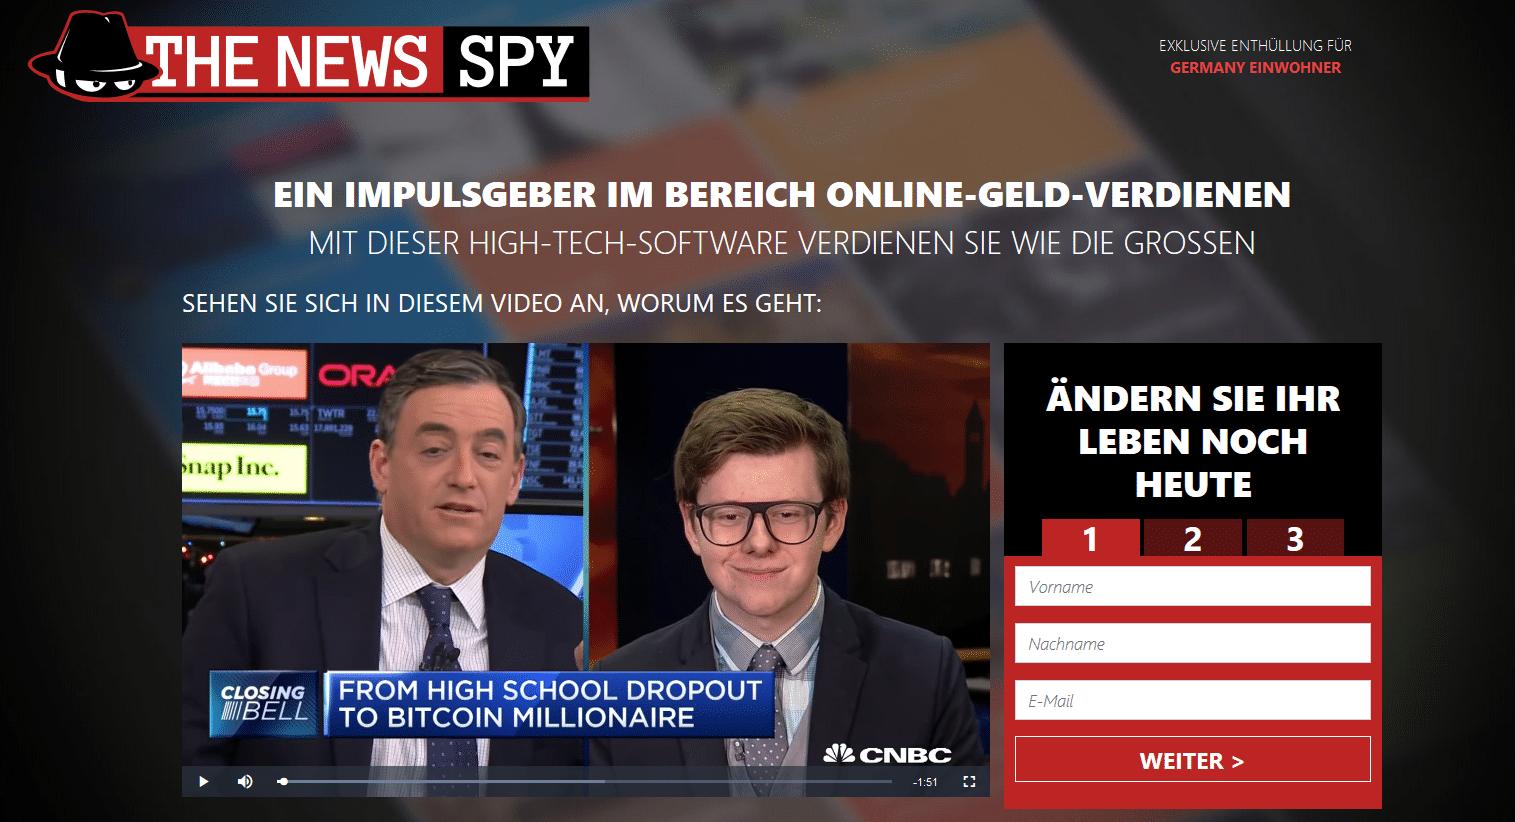 The News Spy - Landingpage